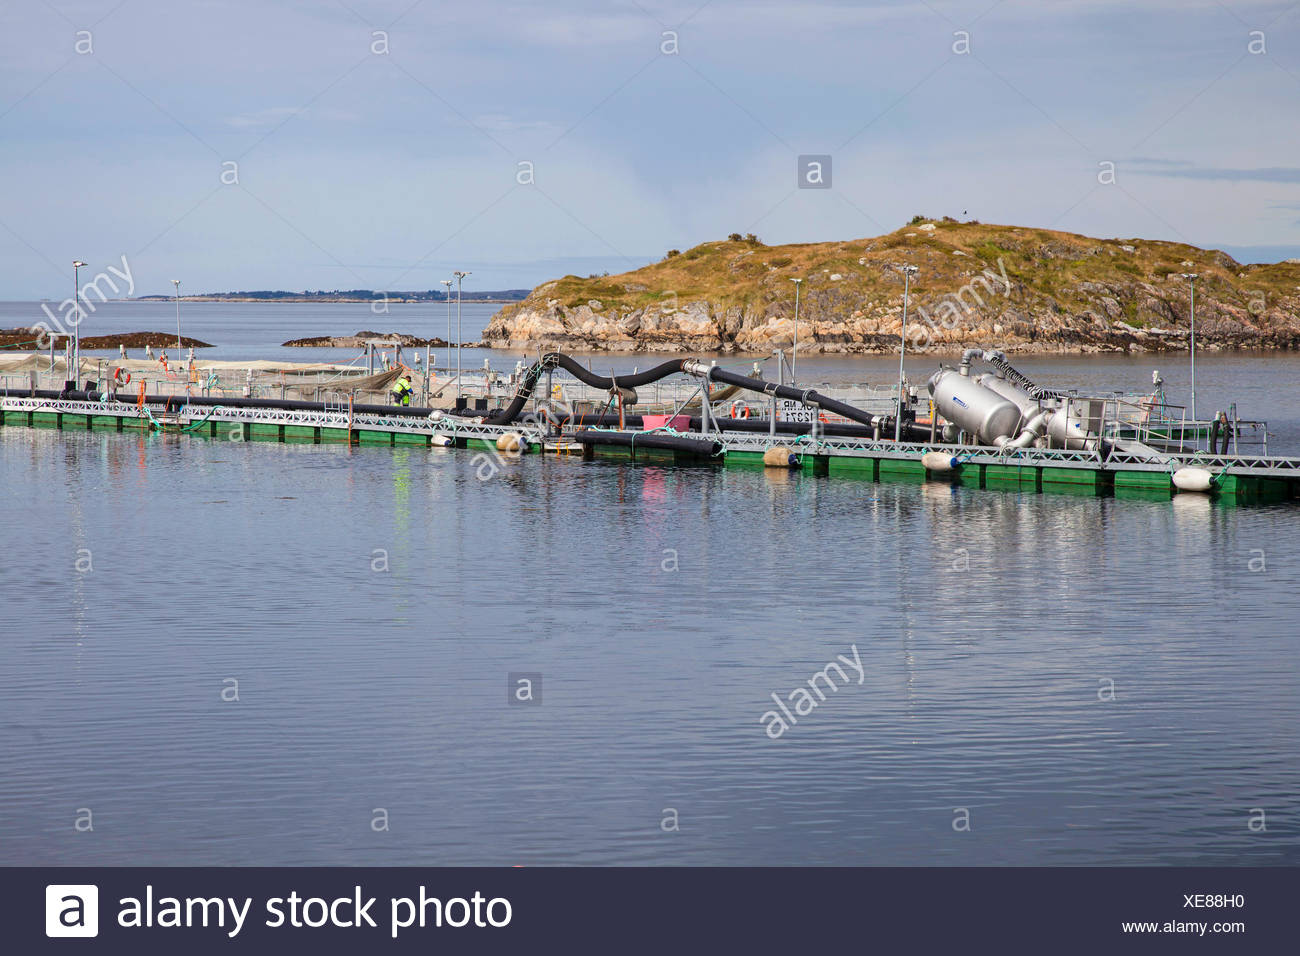 Atlantic salmon, ouananiche, lake Atlantic salmon, landlocked salmon, Sebago salmon (Salmo salar), salmonid farm, Norway, Hitra - Stock Image